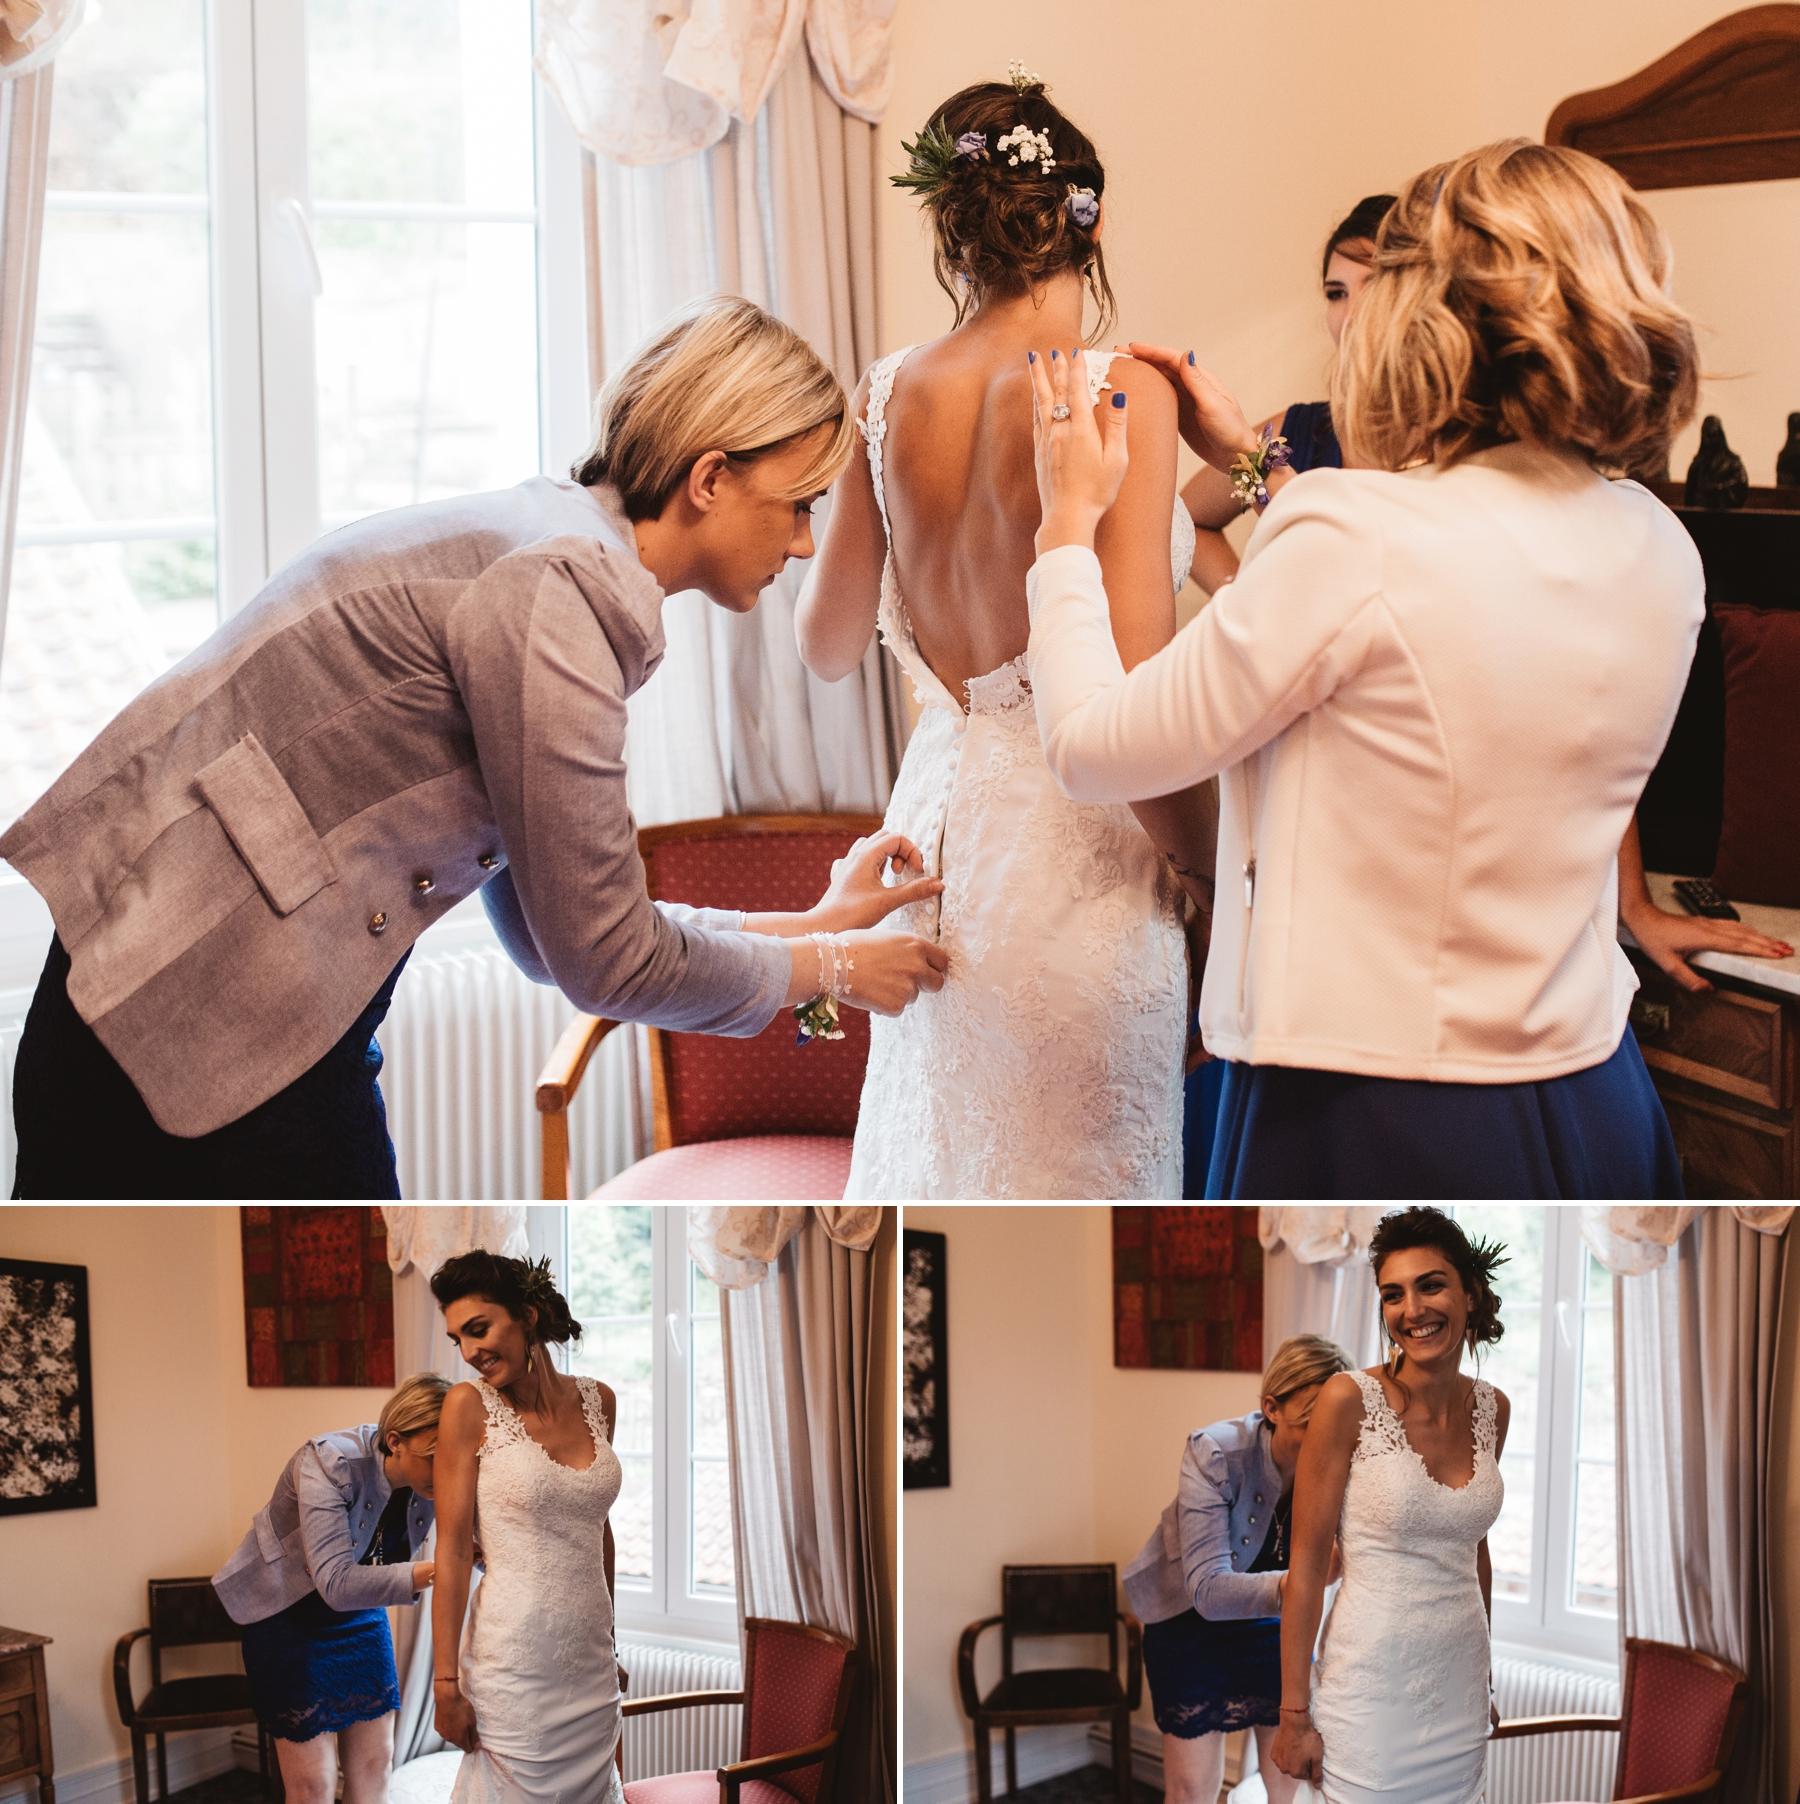 mariage-relais-gensbourg-raphaelmelka-22.jpg